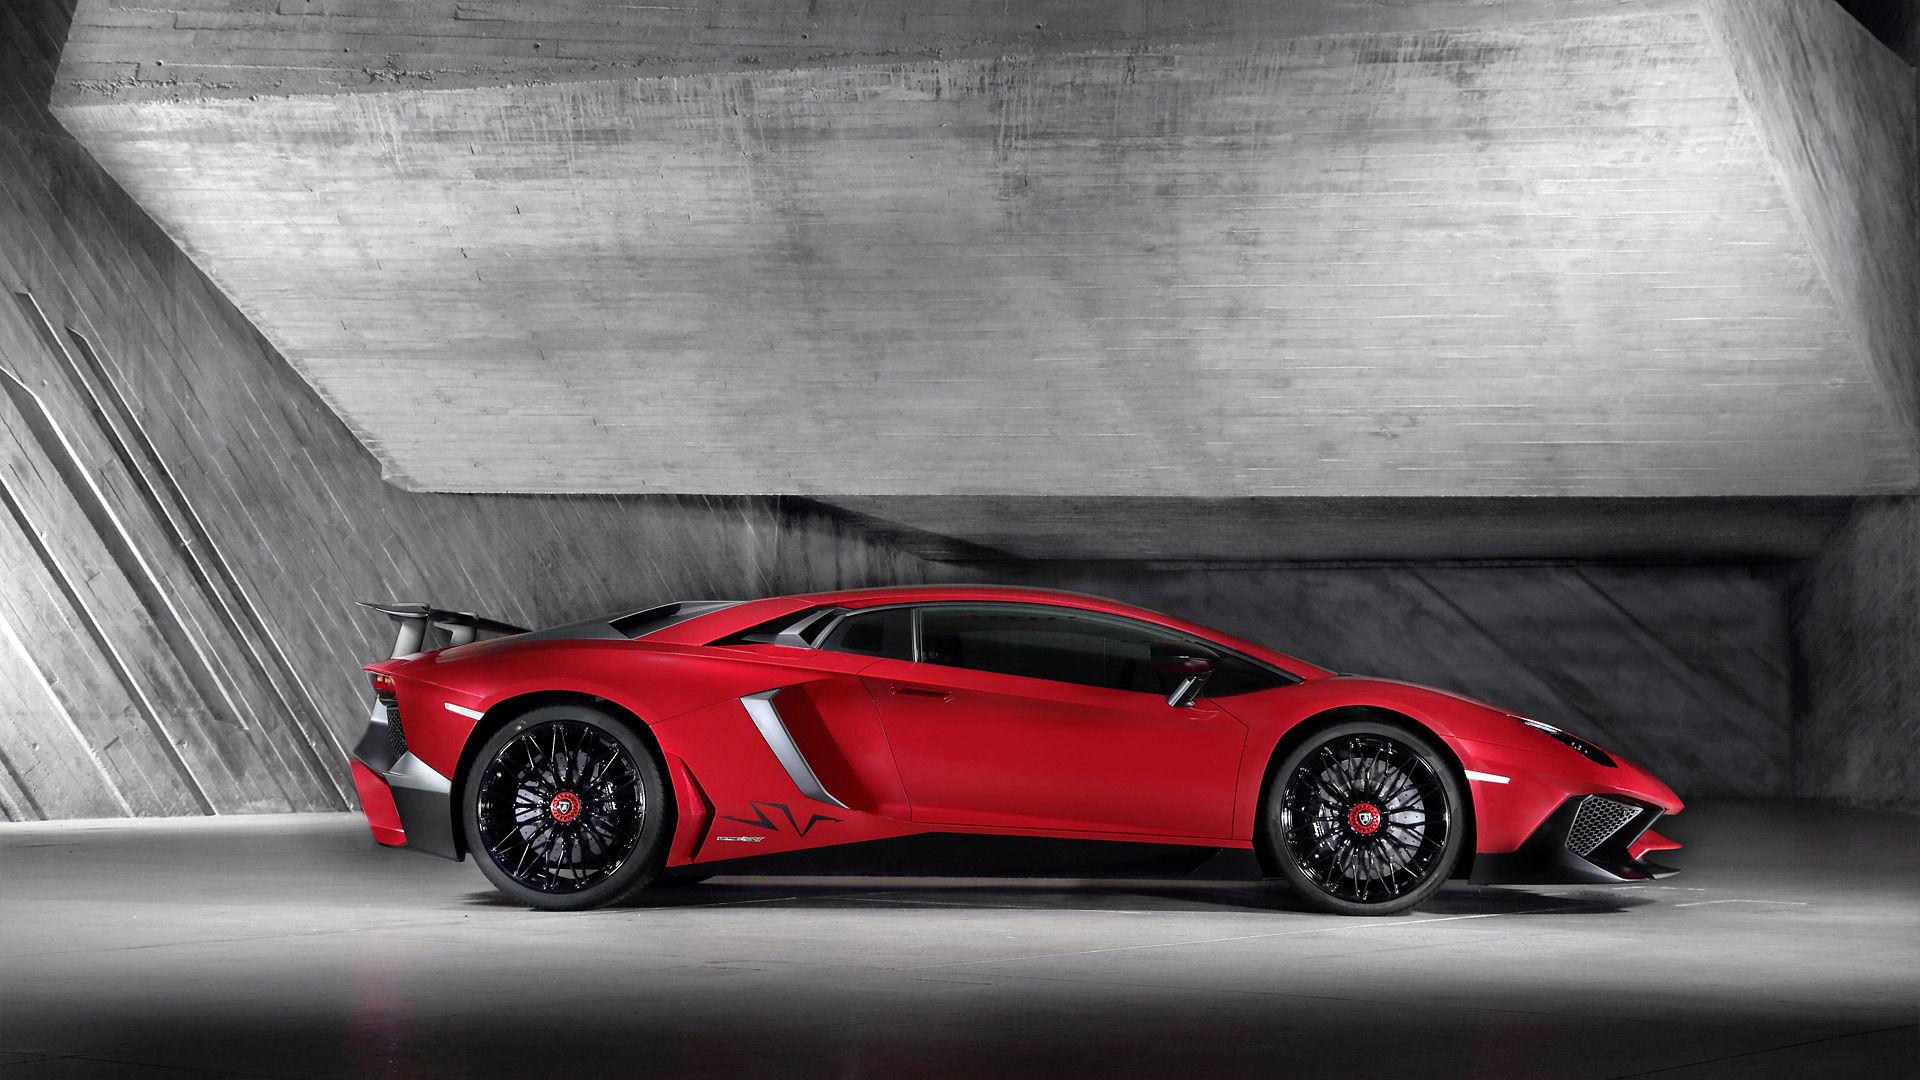 2016 Lamborghini Aventador LP750-4 SV